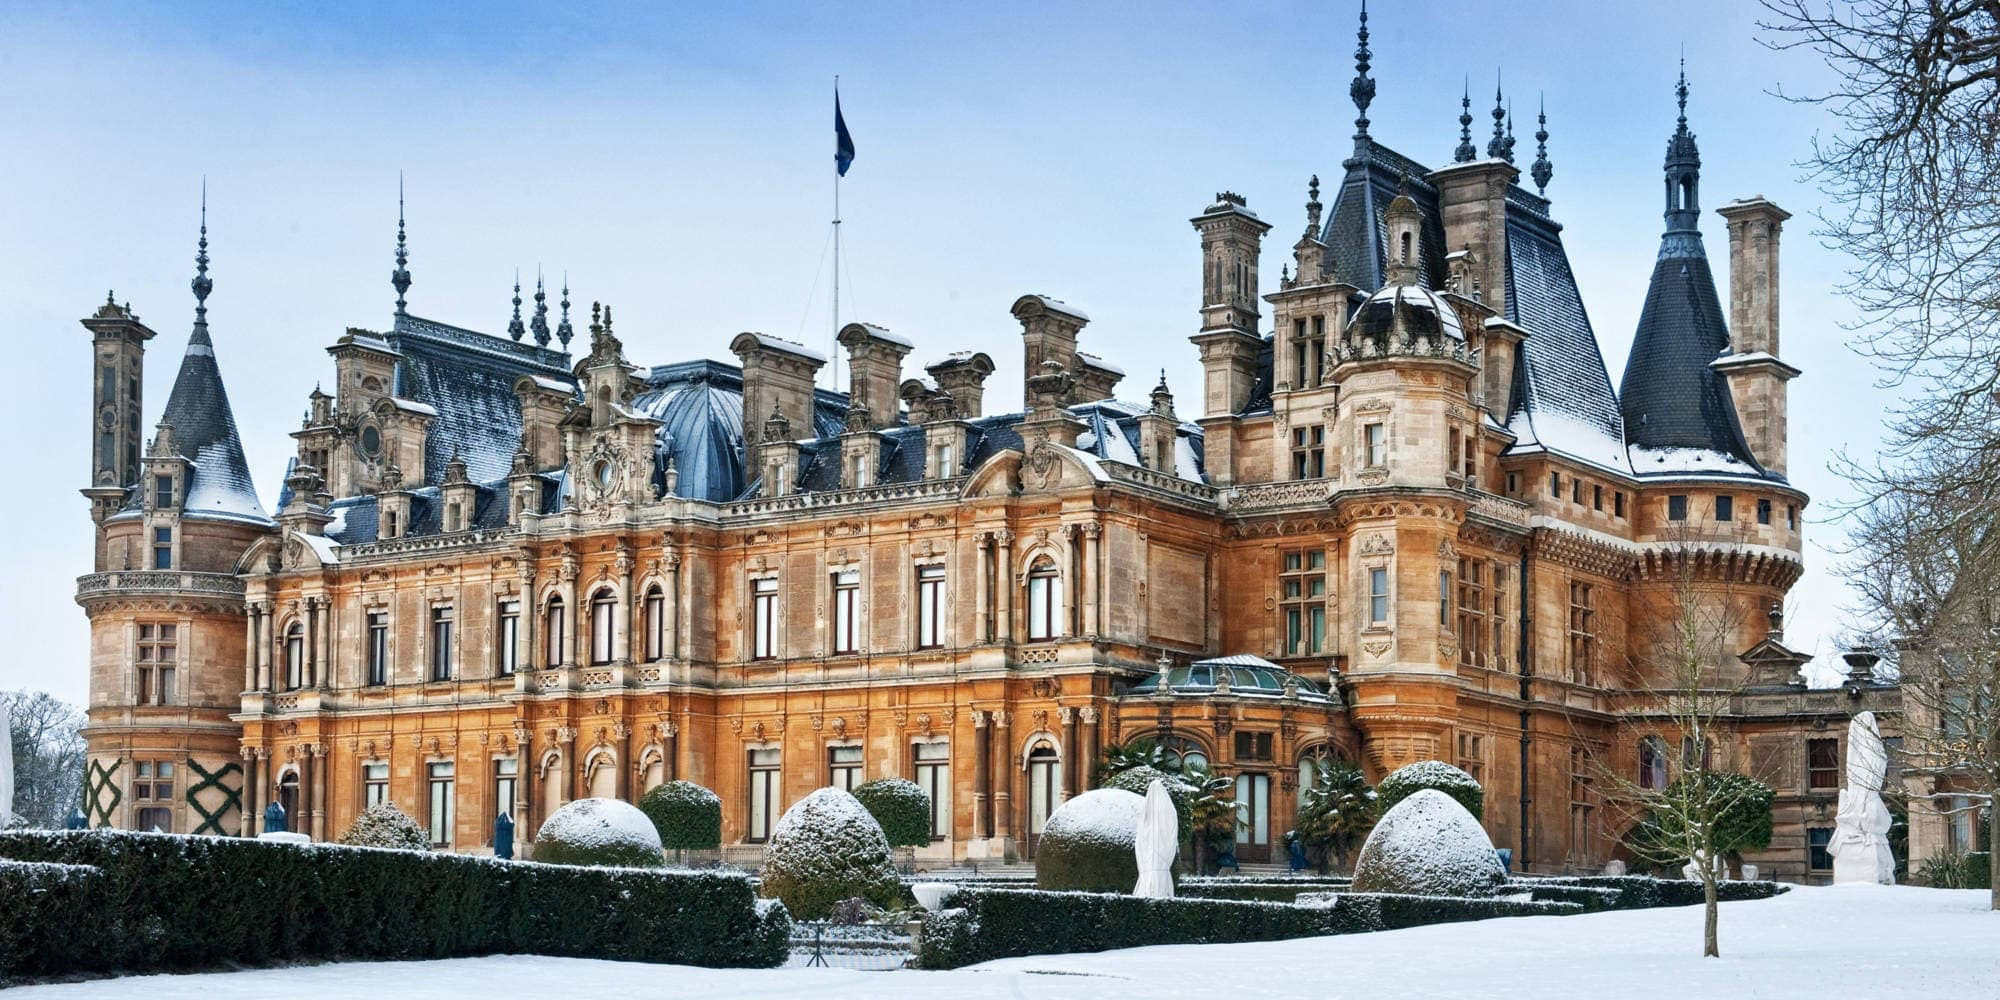 waddesdon-manor-snowy